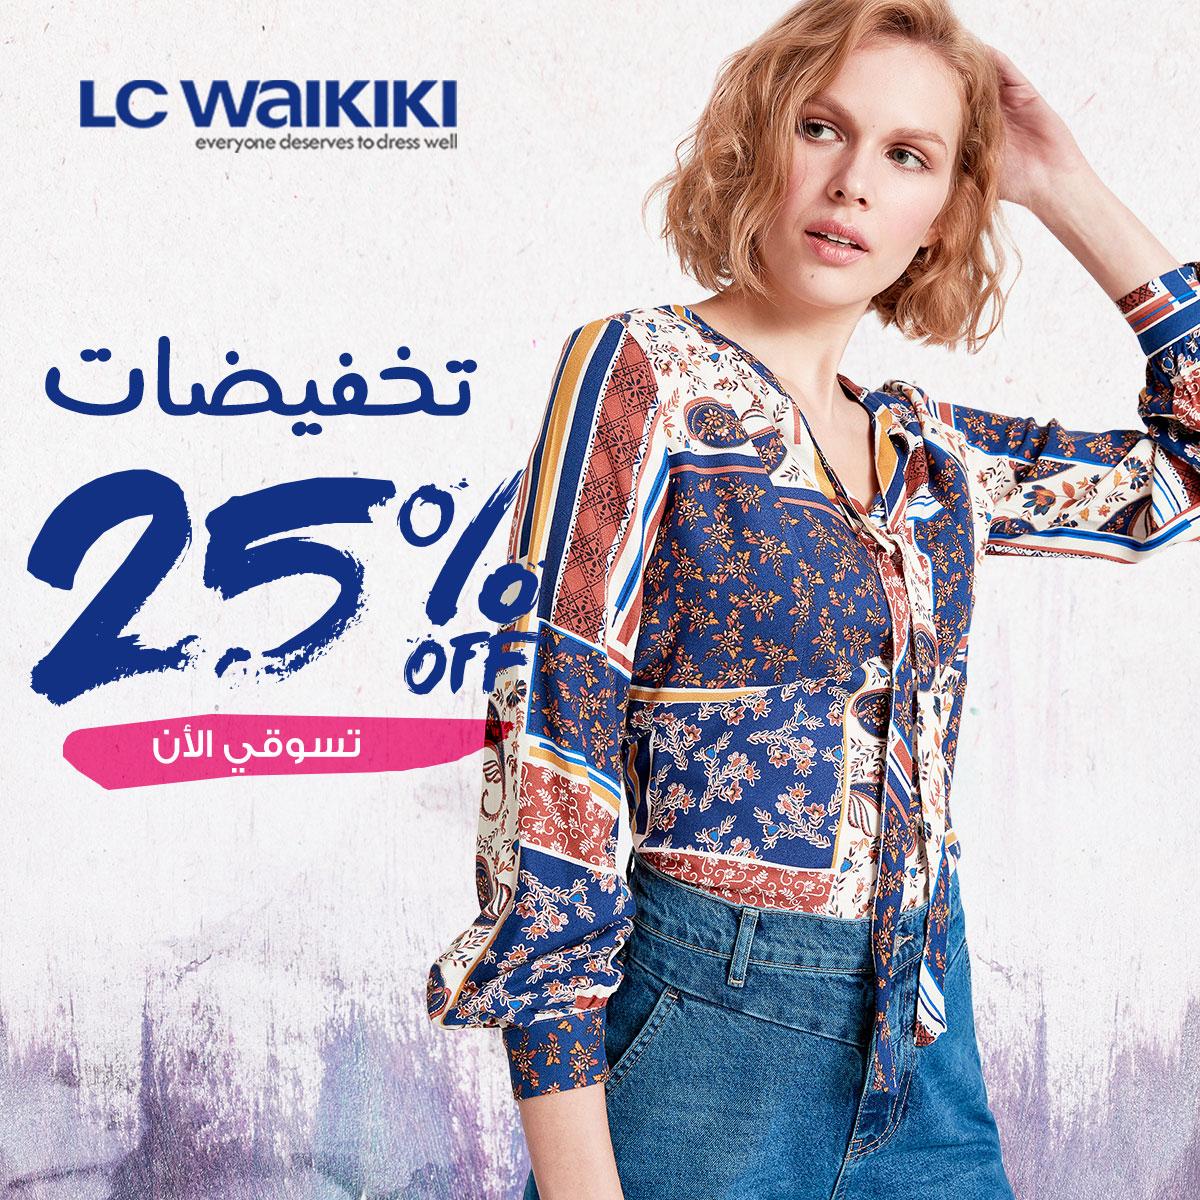 14d598ad3 ملابس المحجبات | ملابس النساء | تسوق اون لاين في تركيا | سوق ادويت